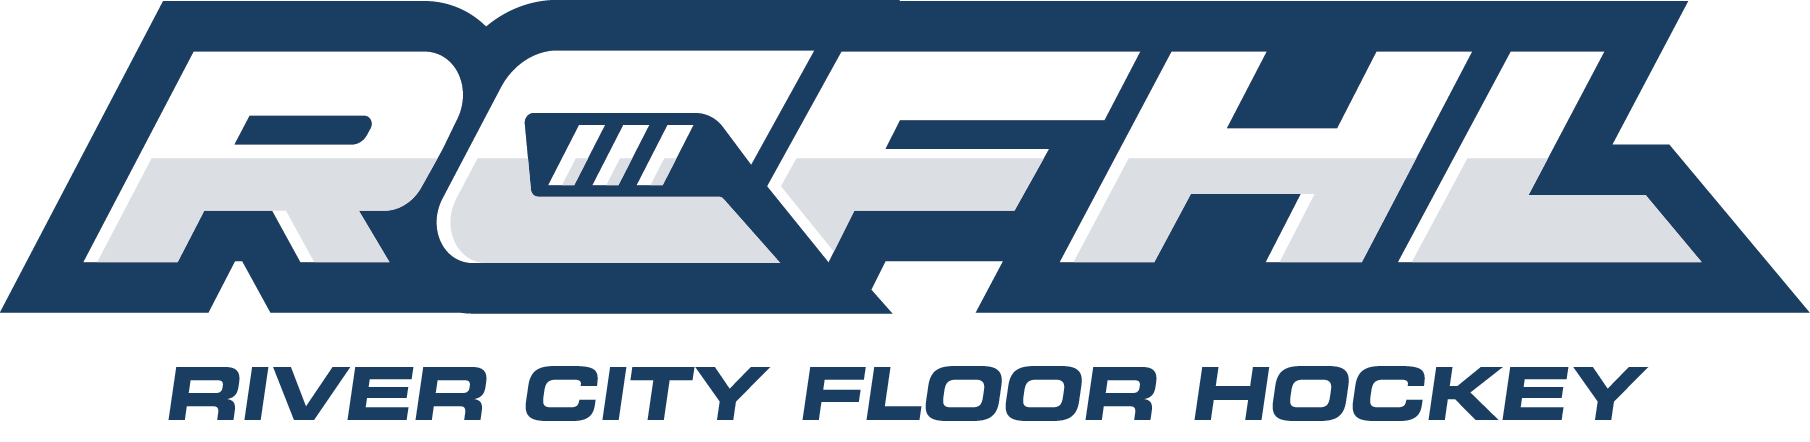 RCFHL logo